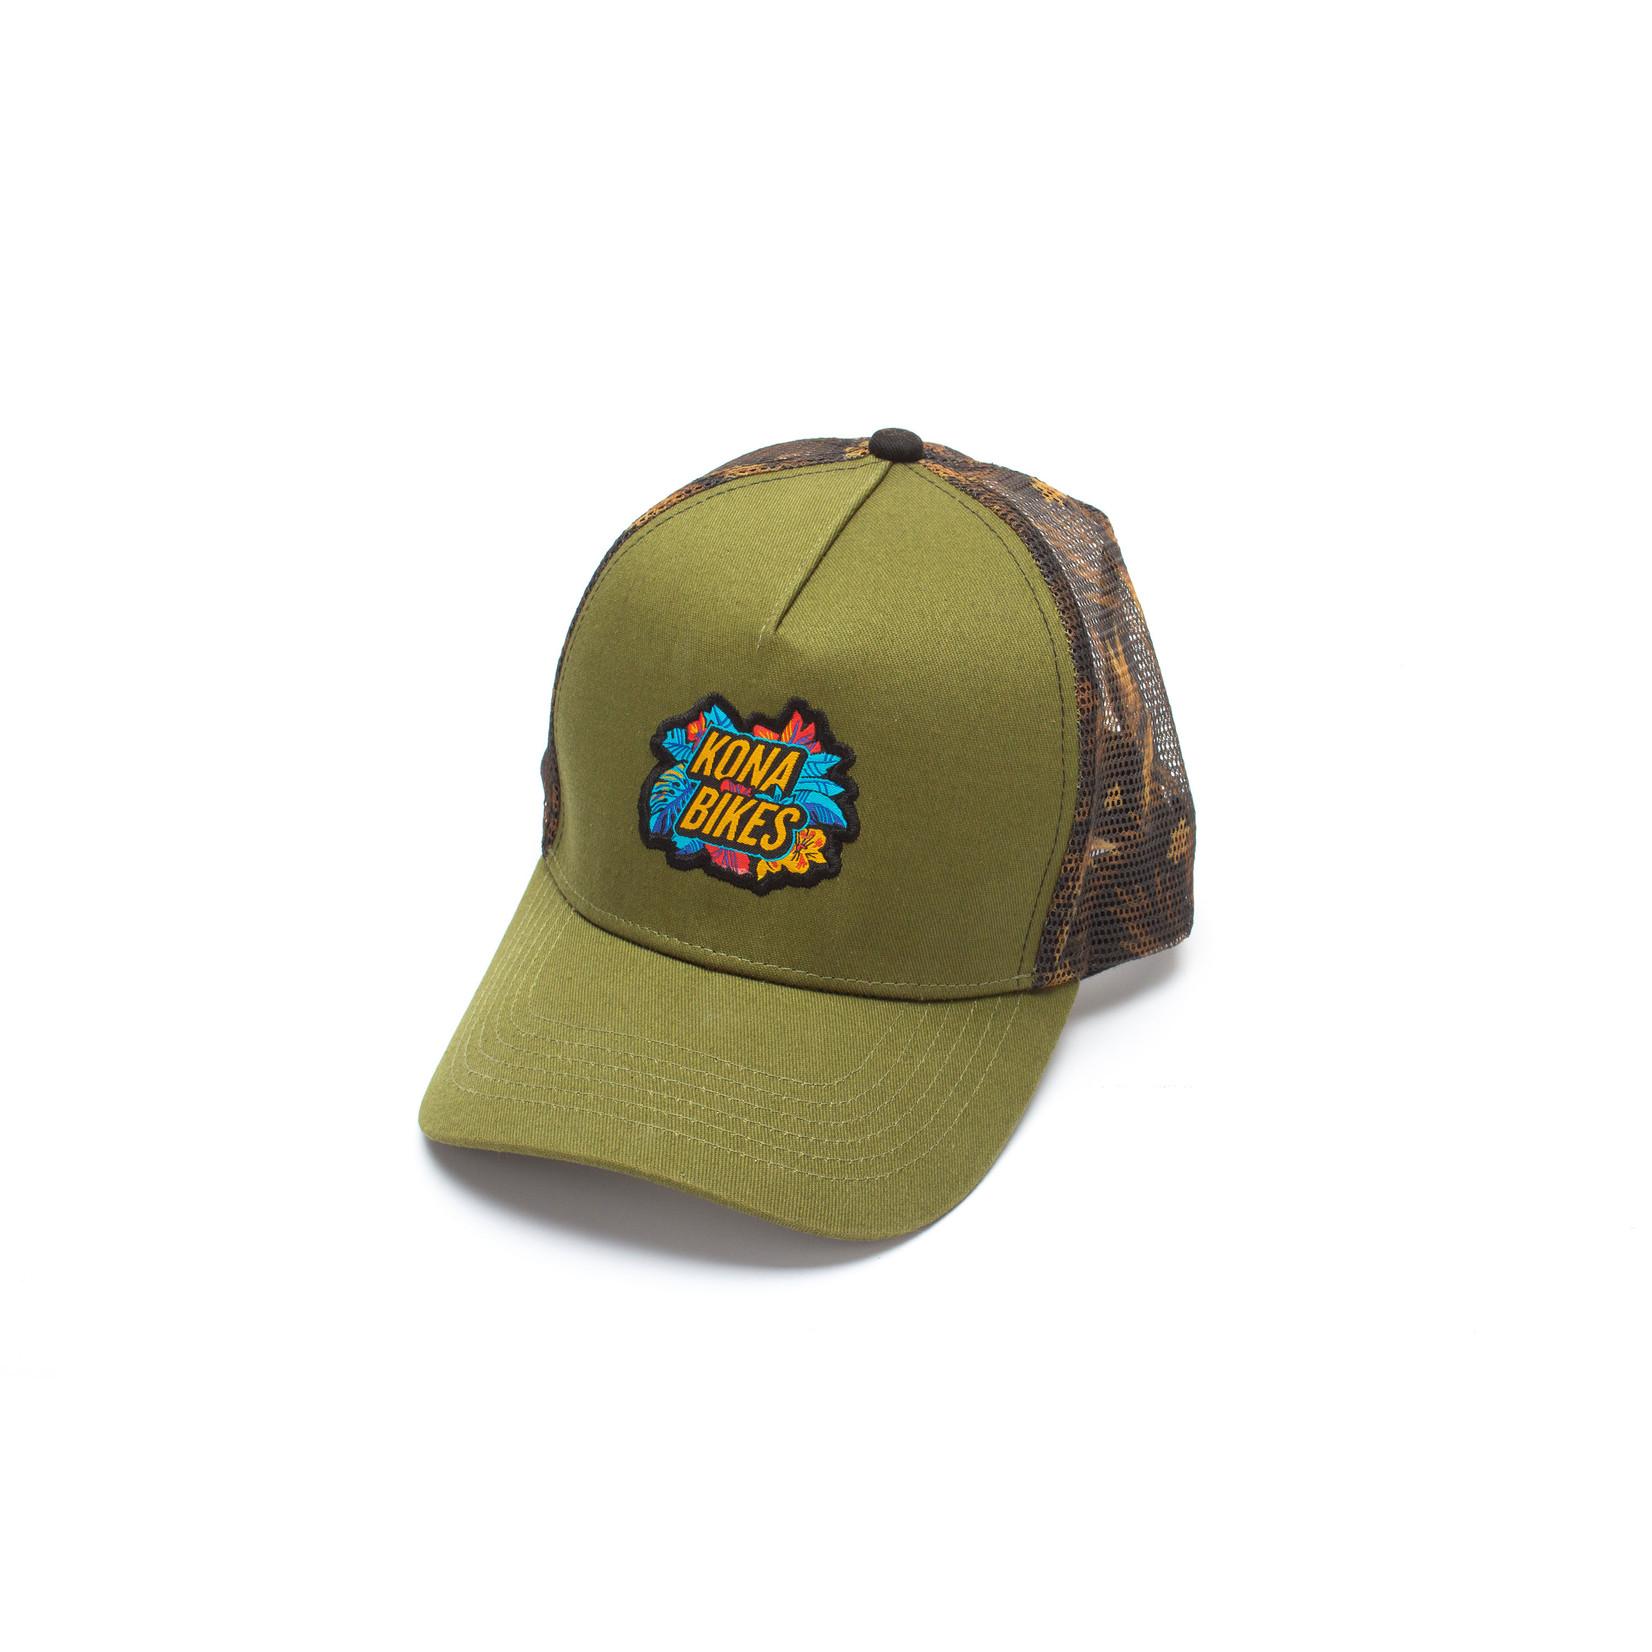 Kona Kona Hawaiki Floral Trucker Hat